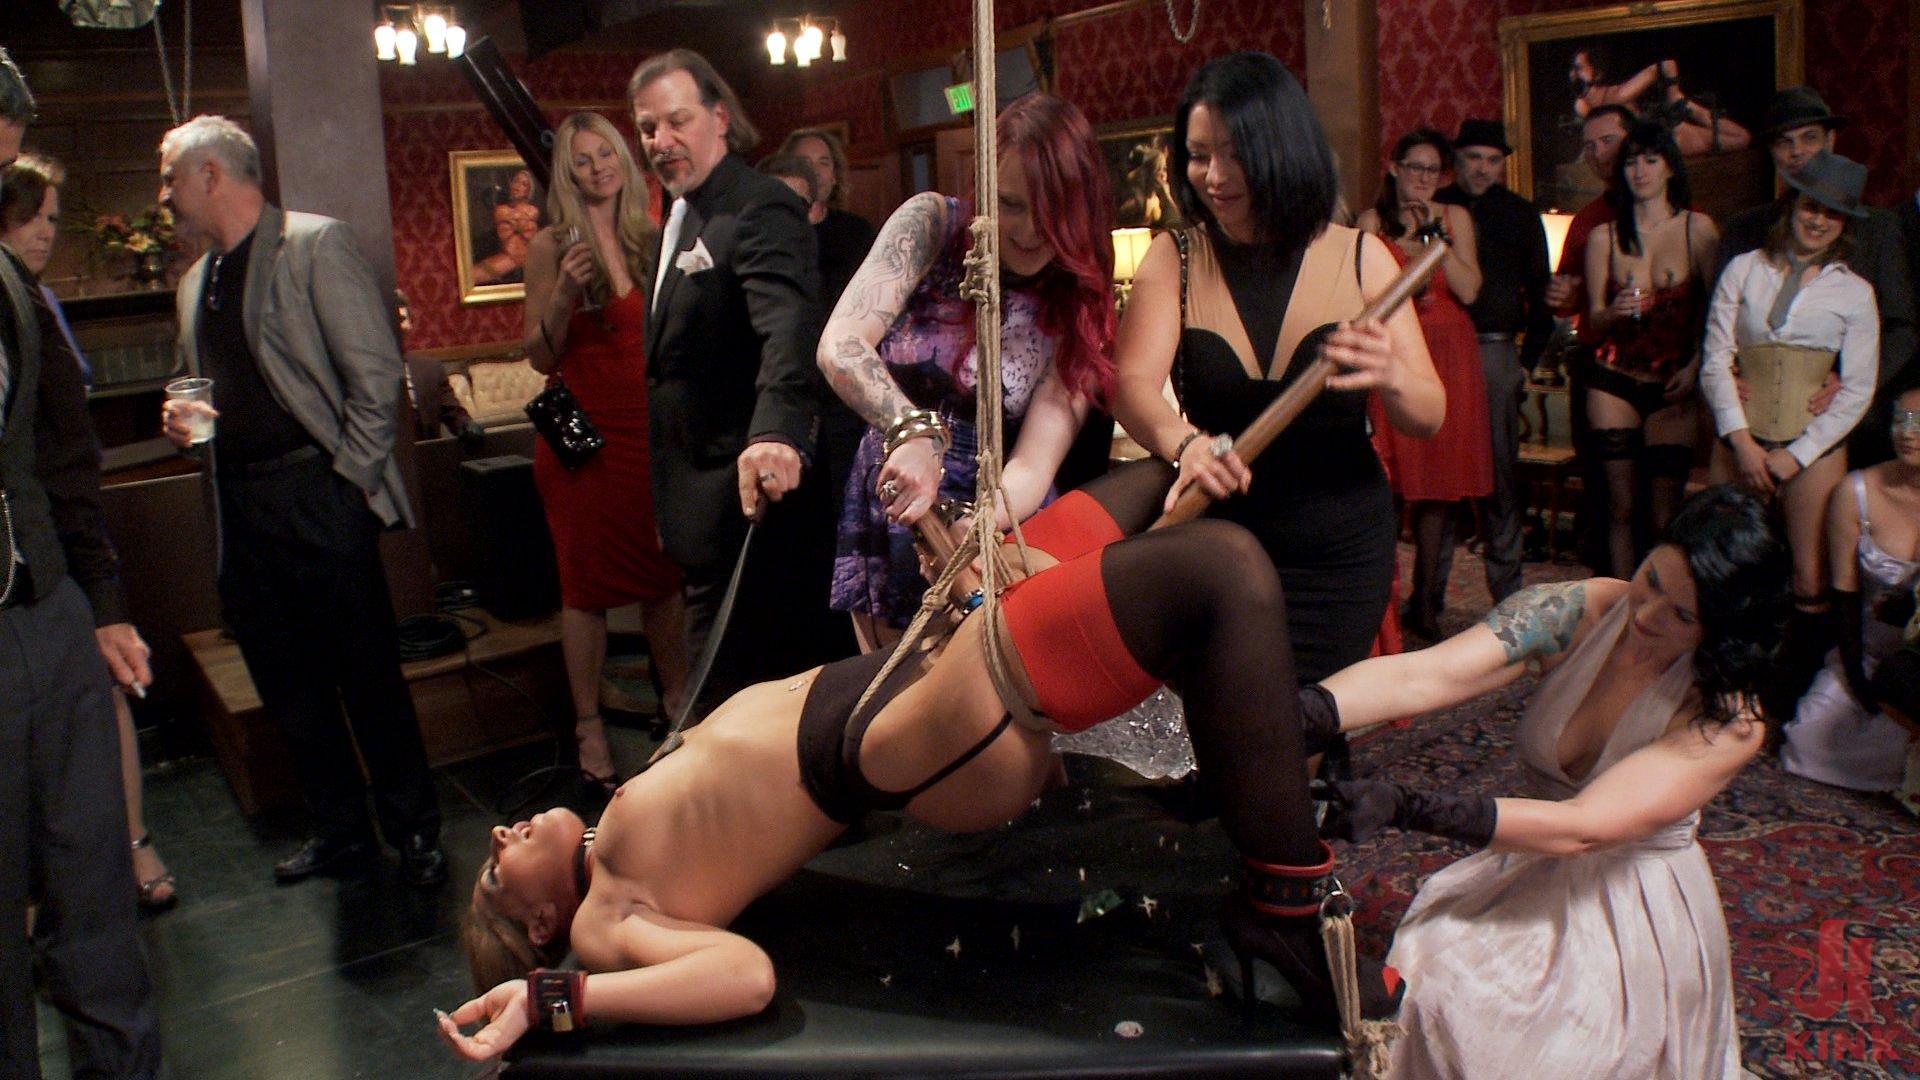 sm party sex in cottbus